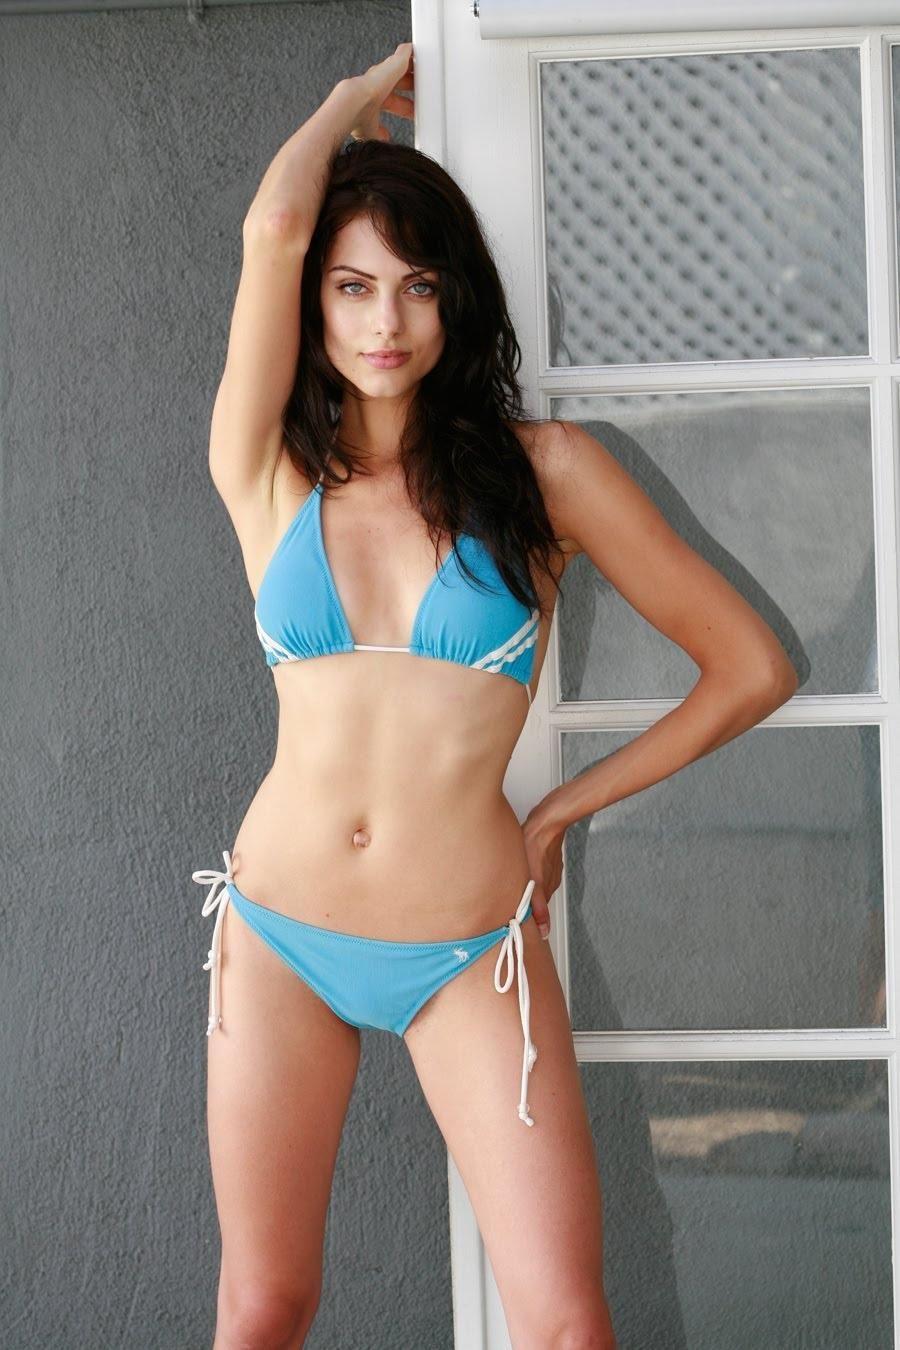 Bikini Julia Voth nude photos 2019